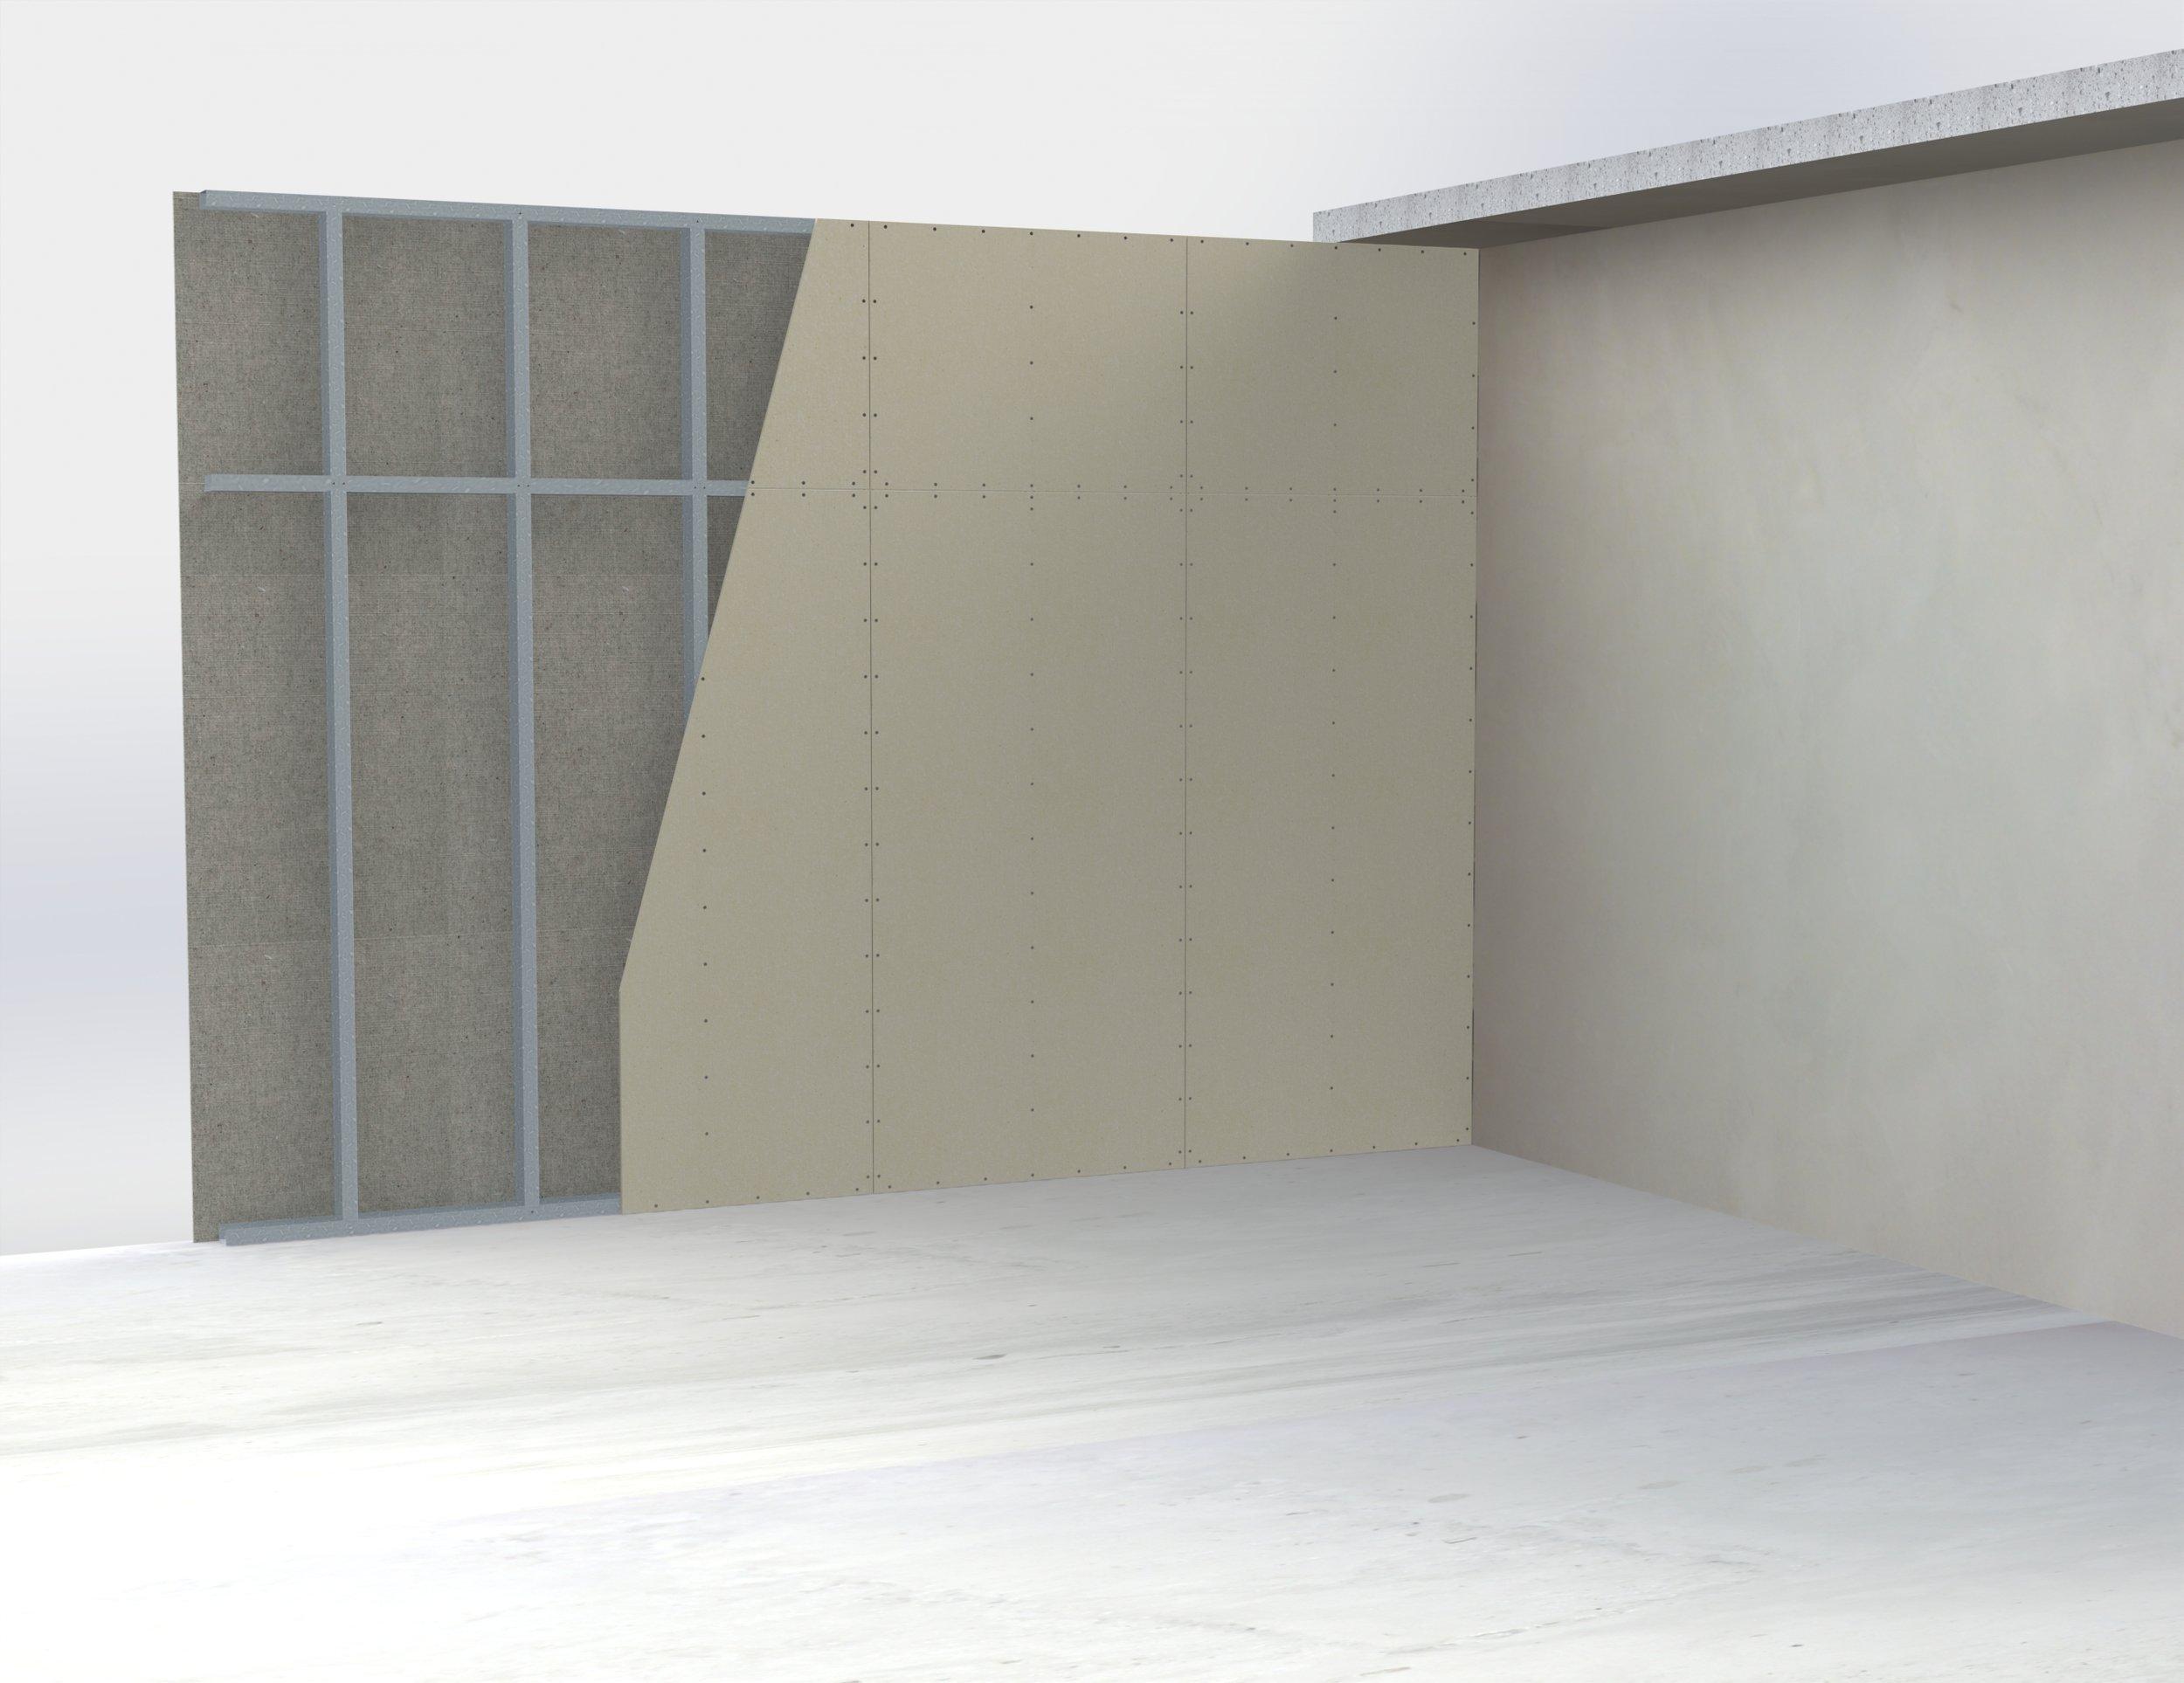 20180831 Weatherpro L External wall (1).jpg